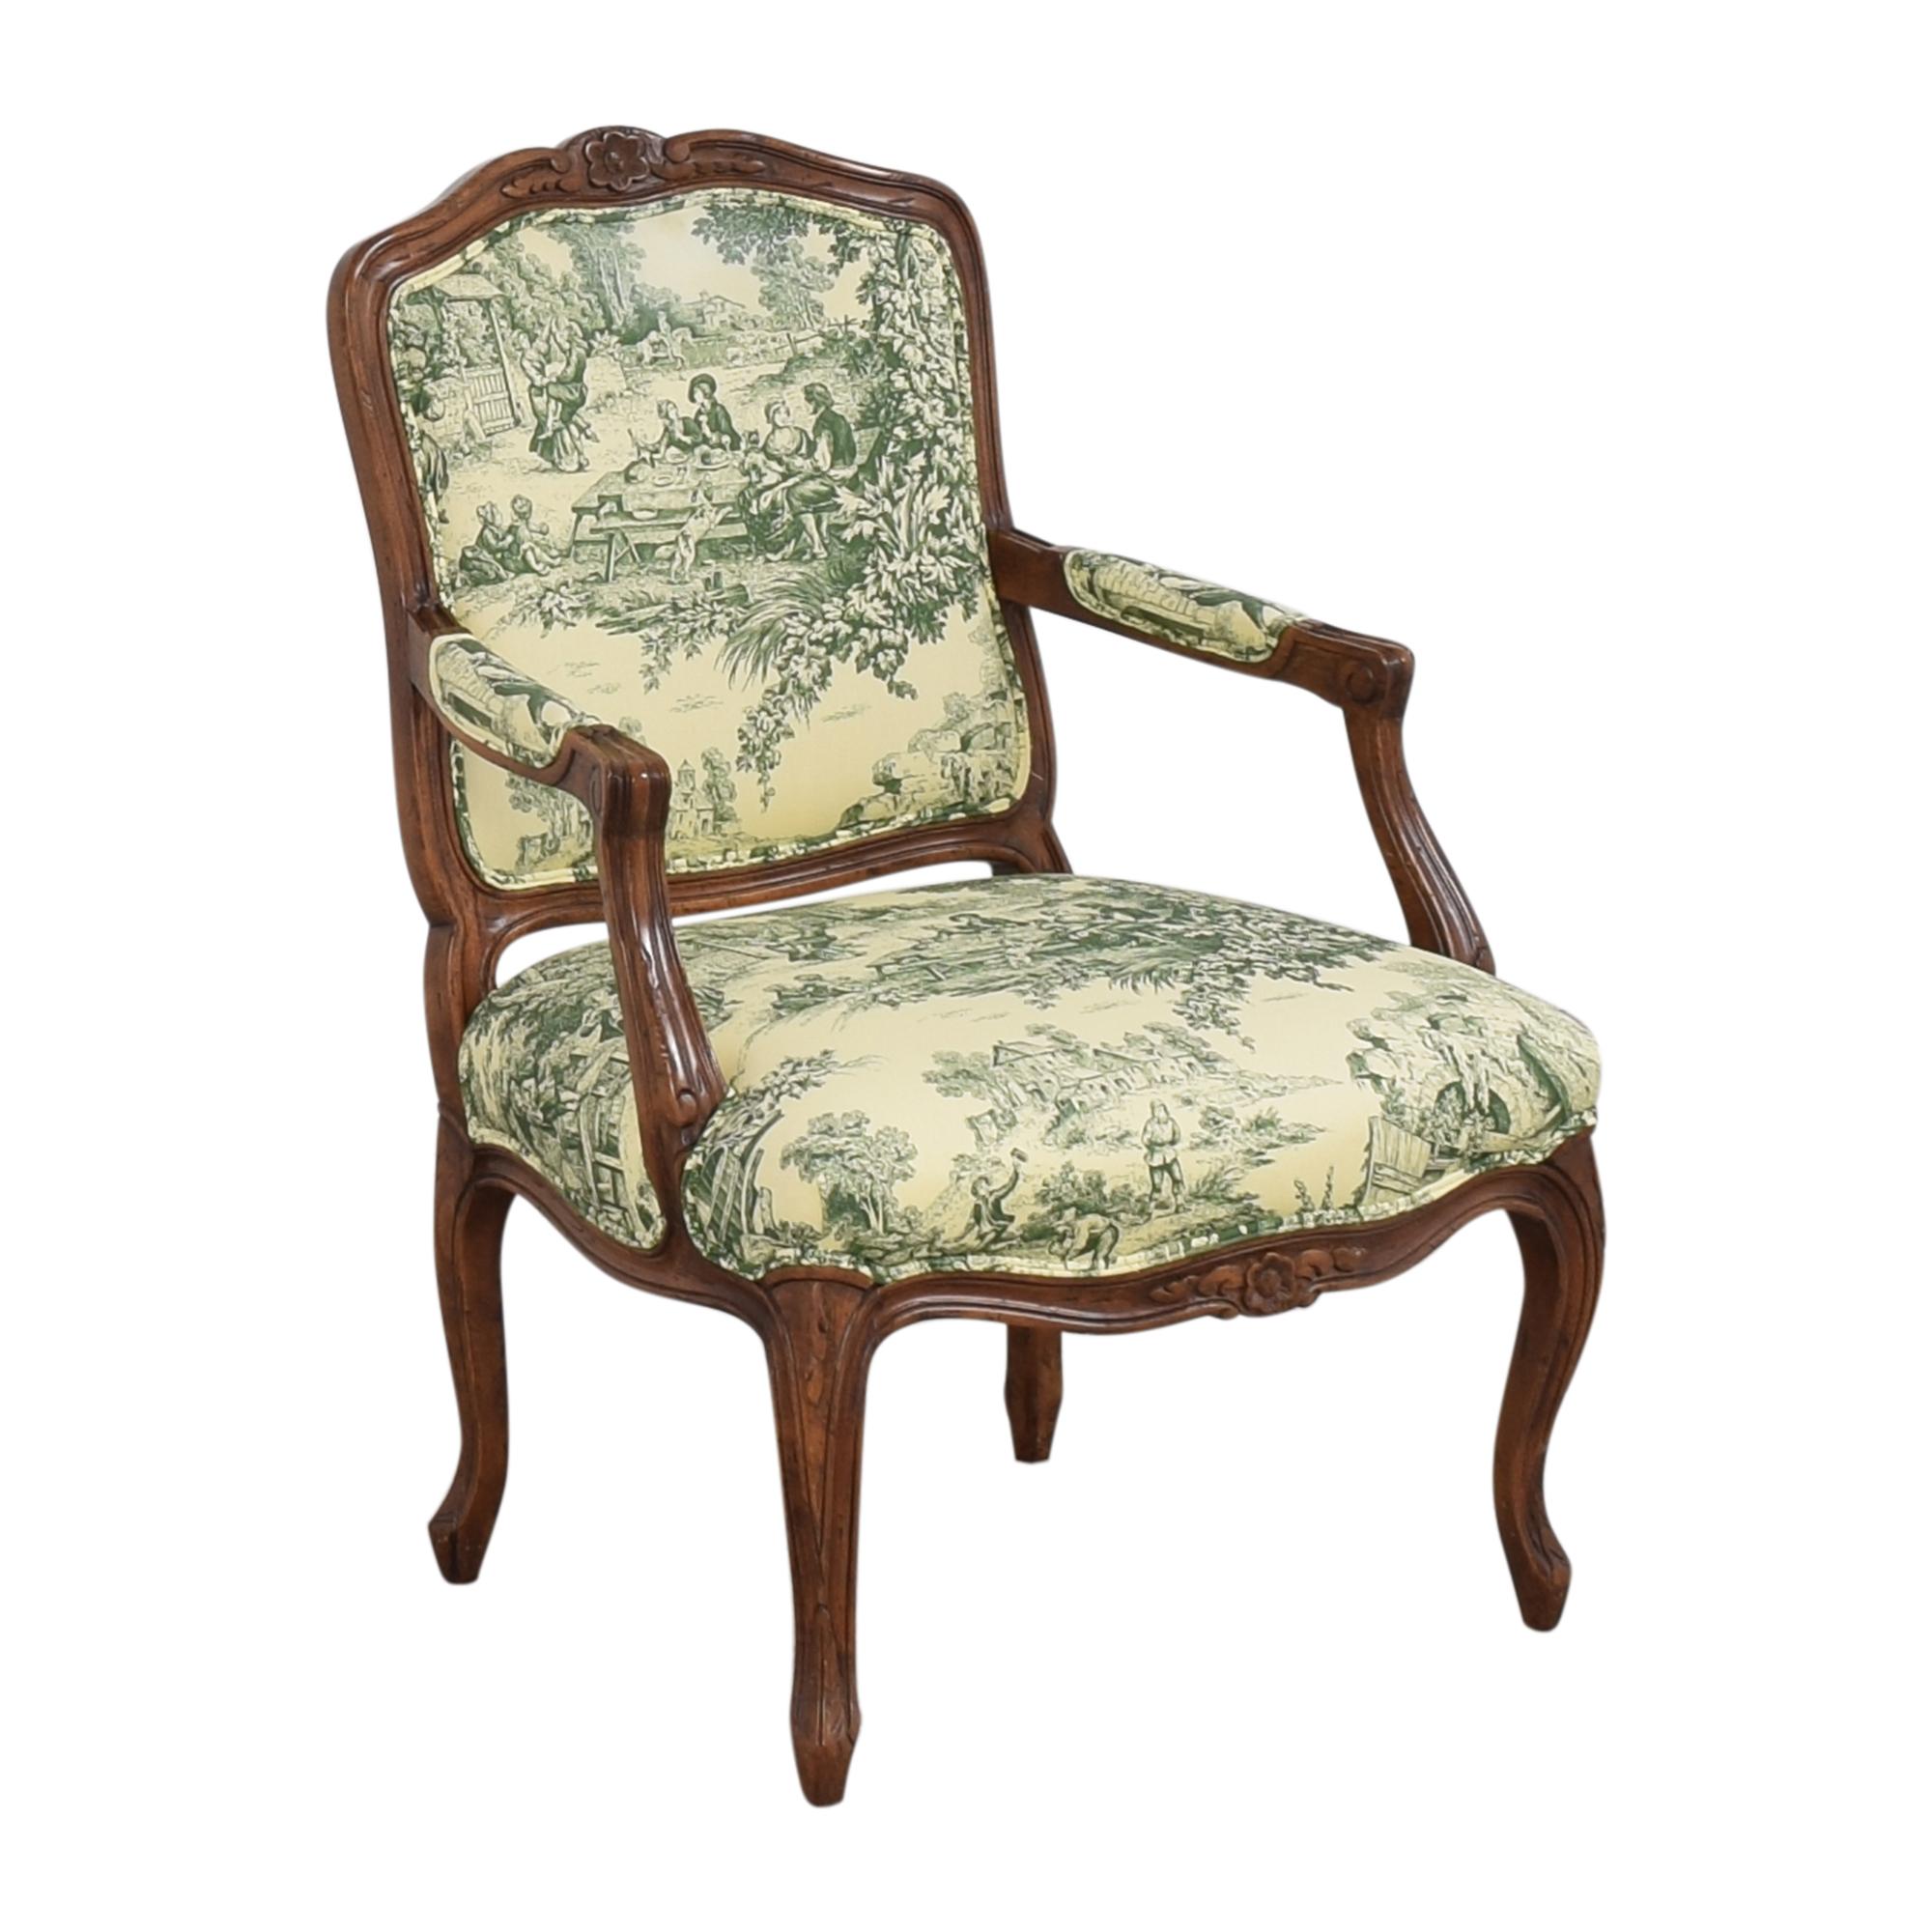 Fremarc Designs Fremarc Designs Upholstered Arm Chair on sale